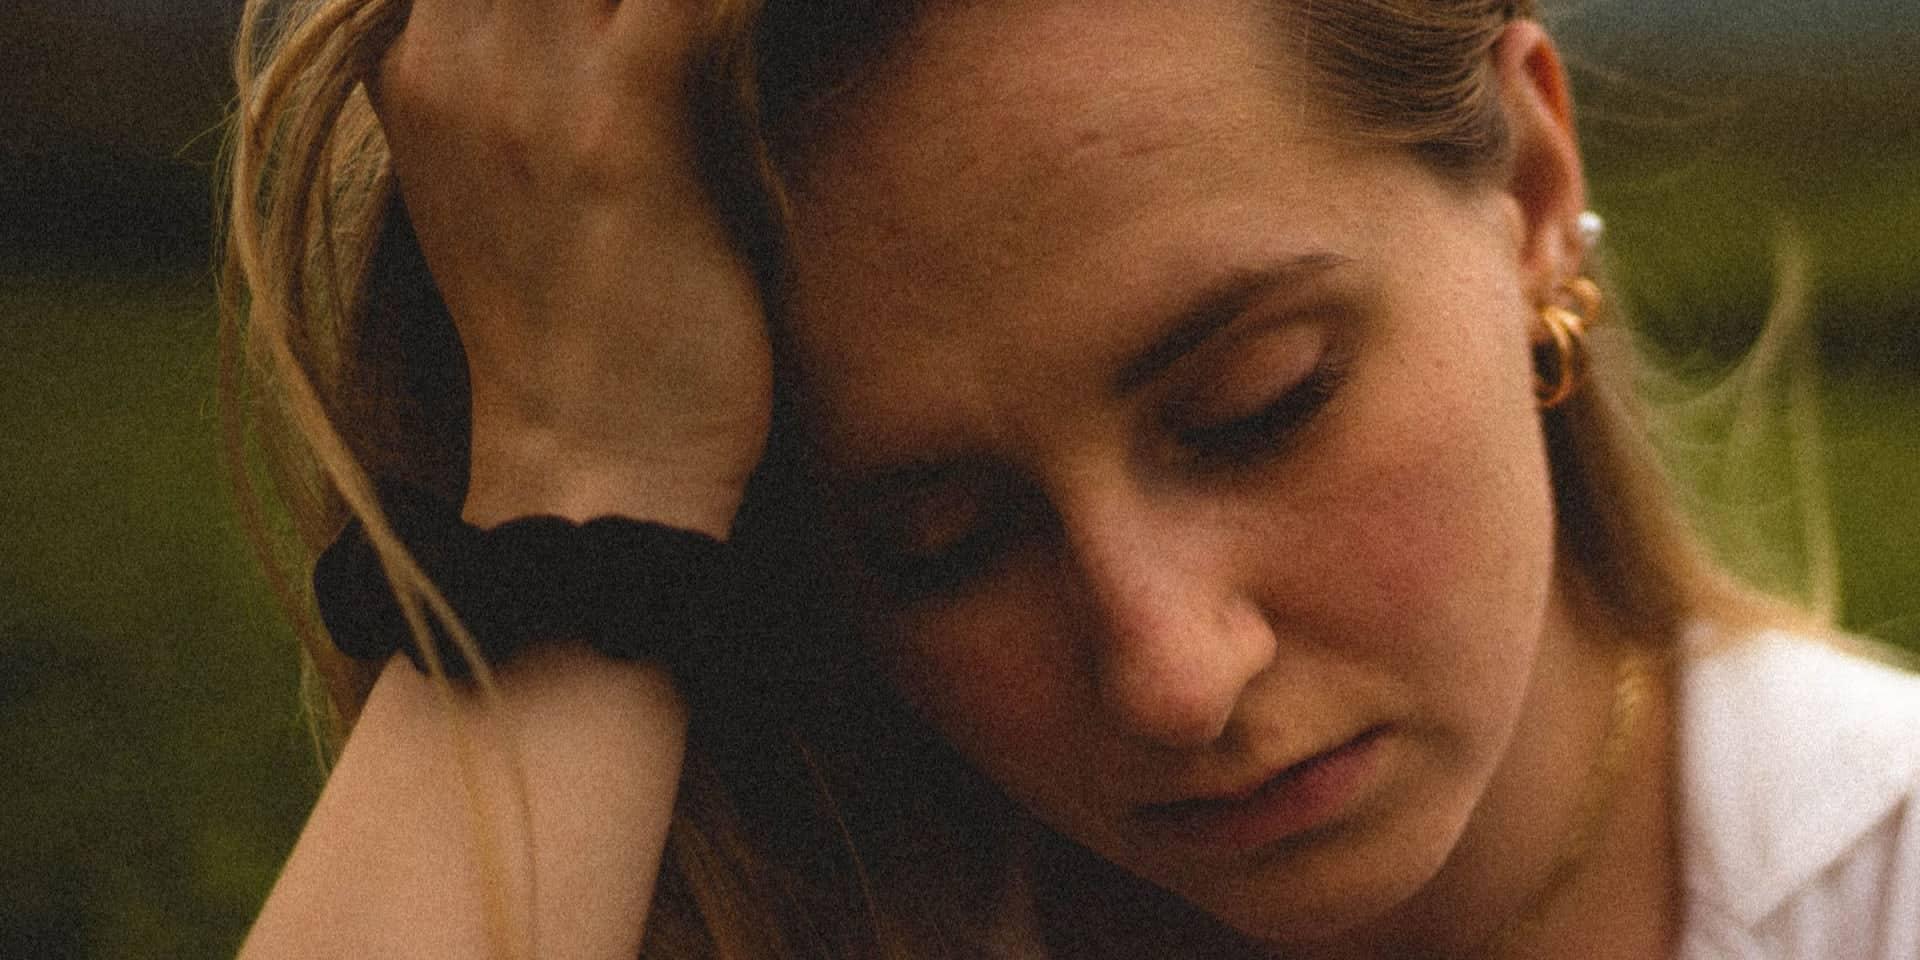 woman stressed about custody battle